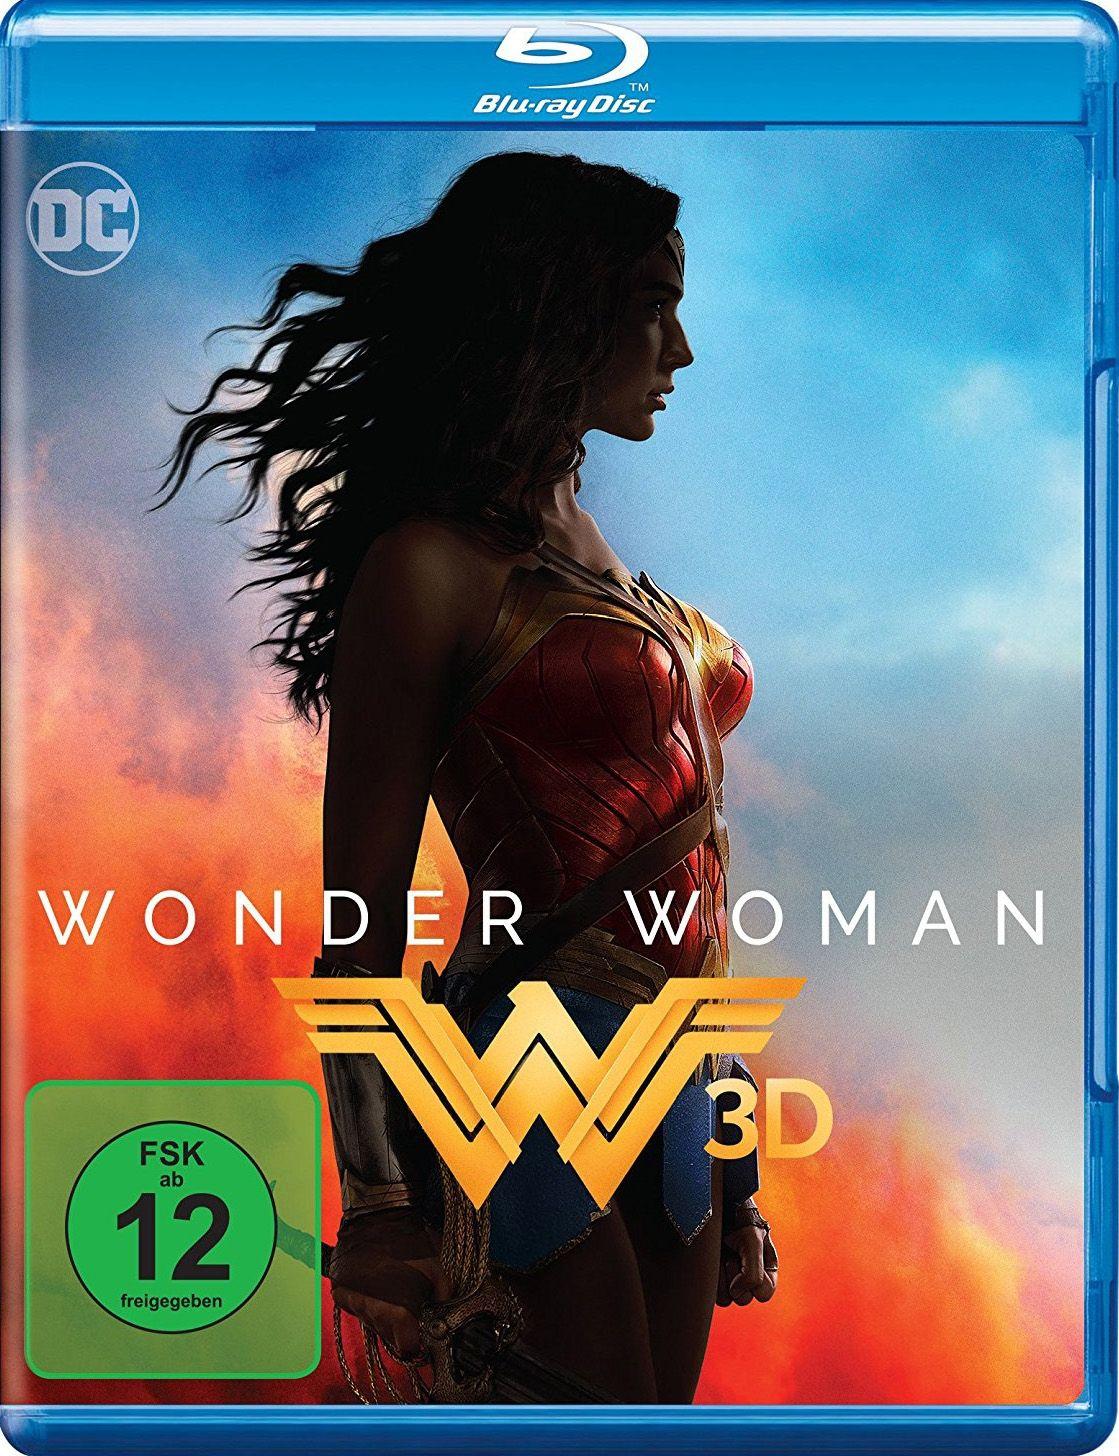 Wonder Woman (BLURAY 3D)